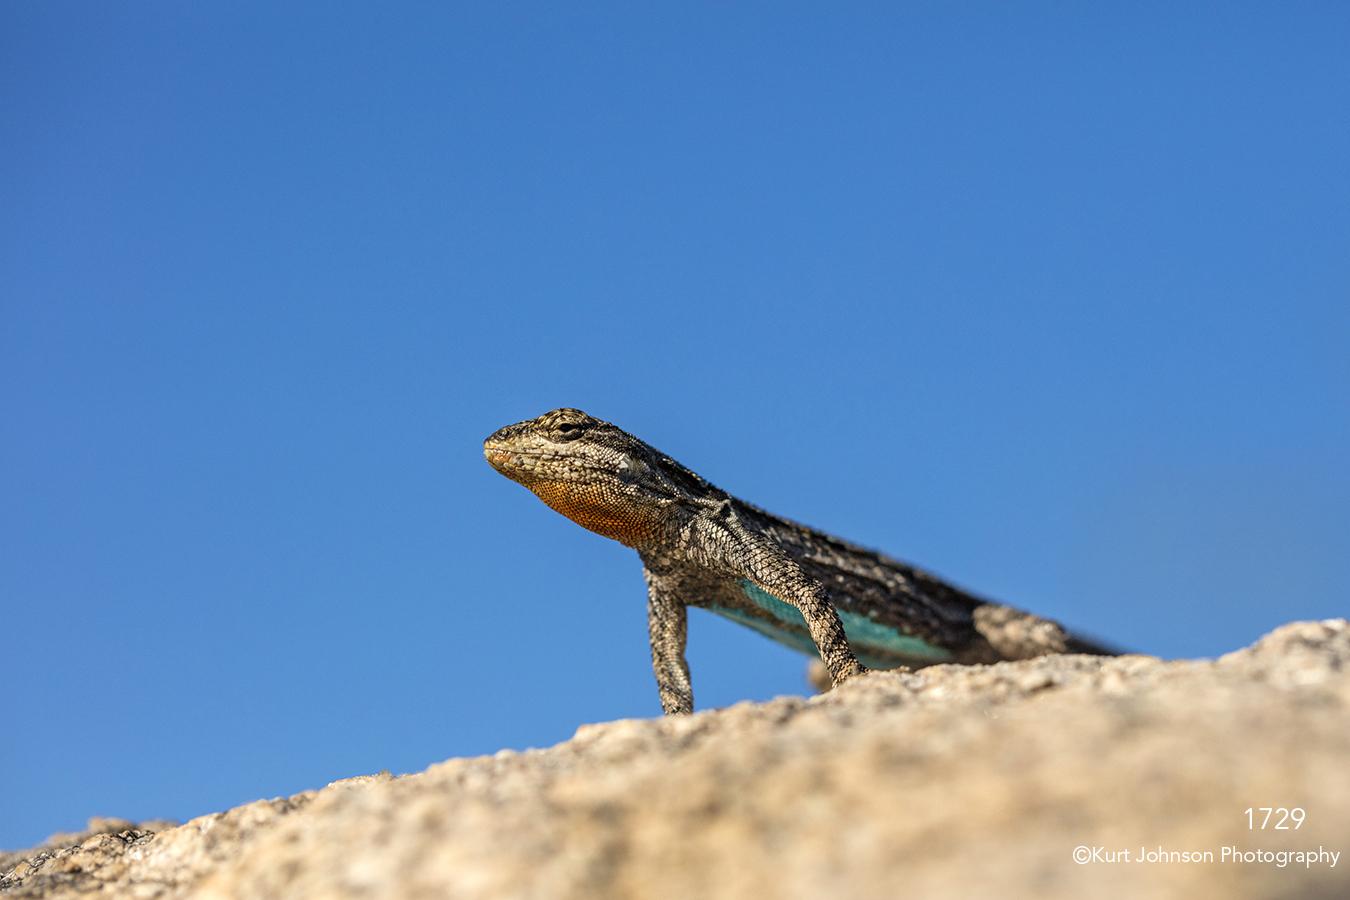 southwest lizard wildlife animal blue